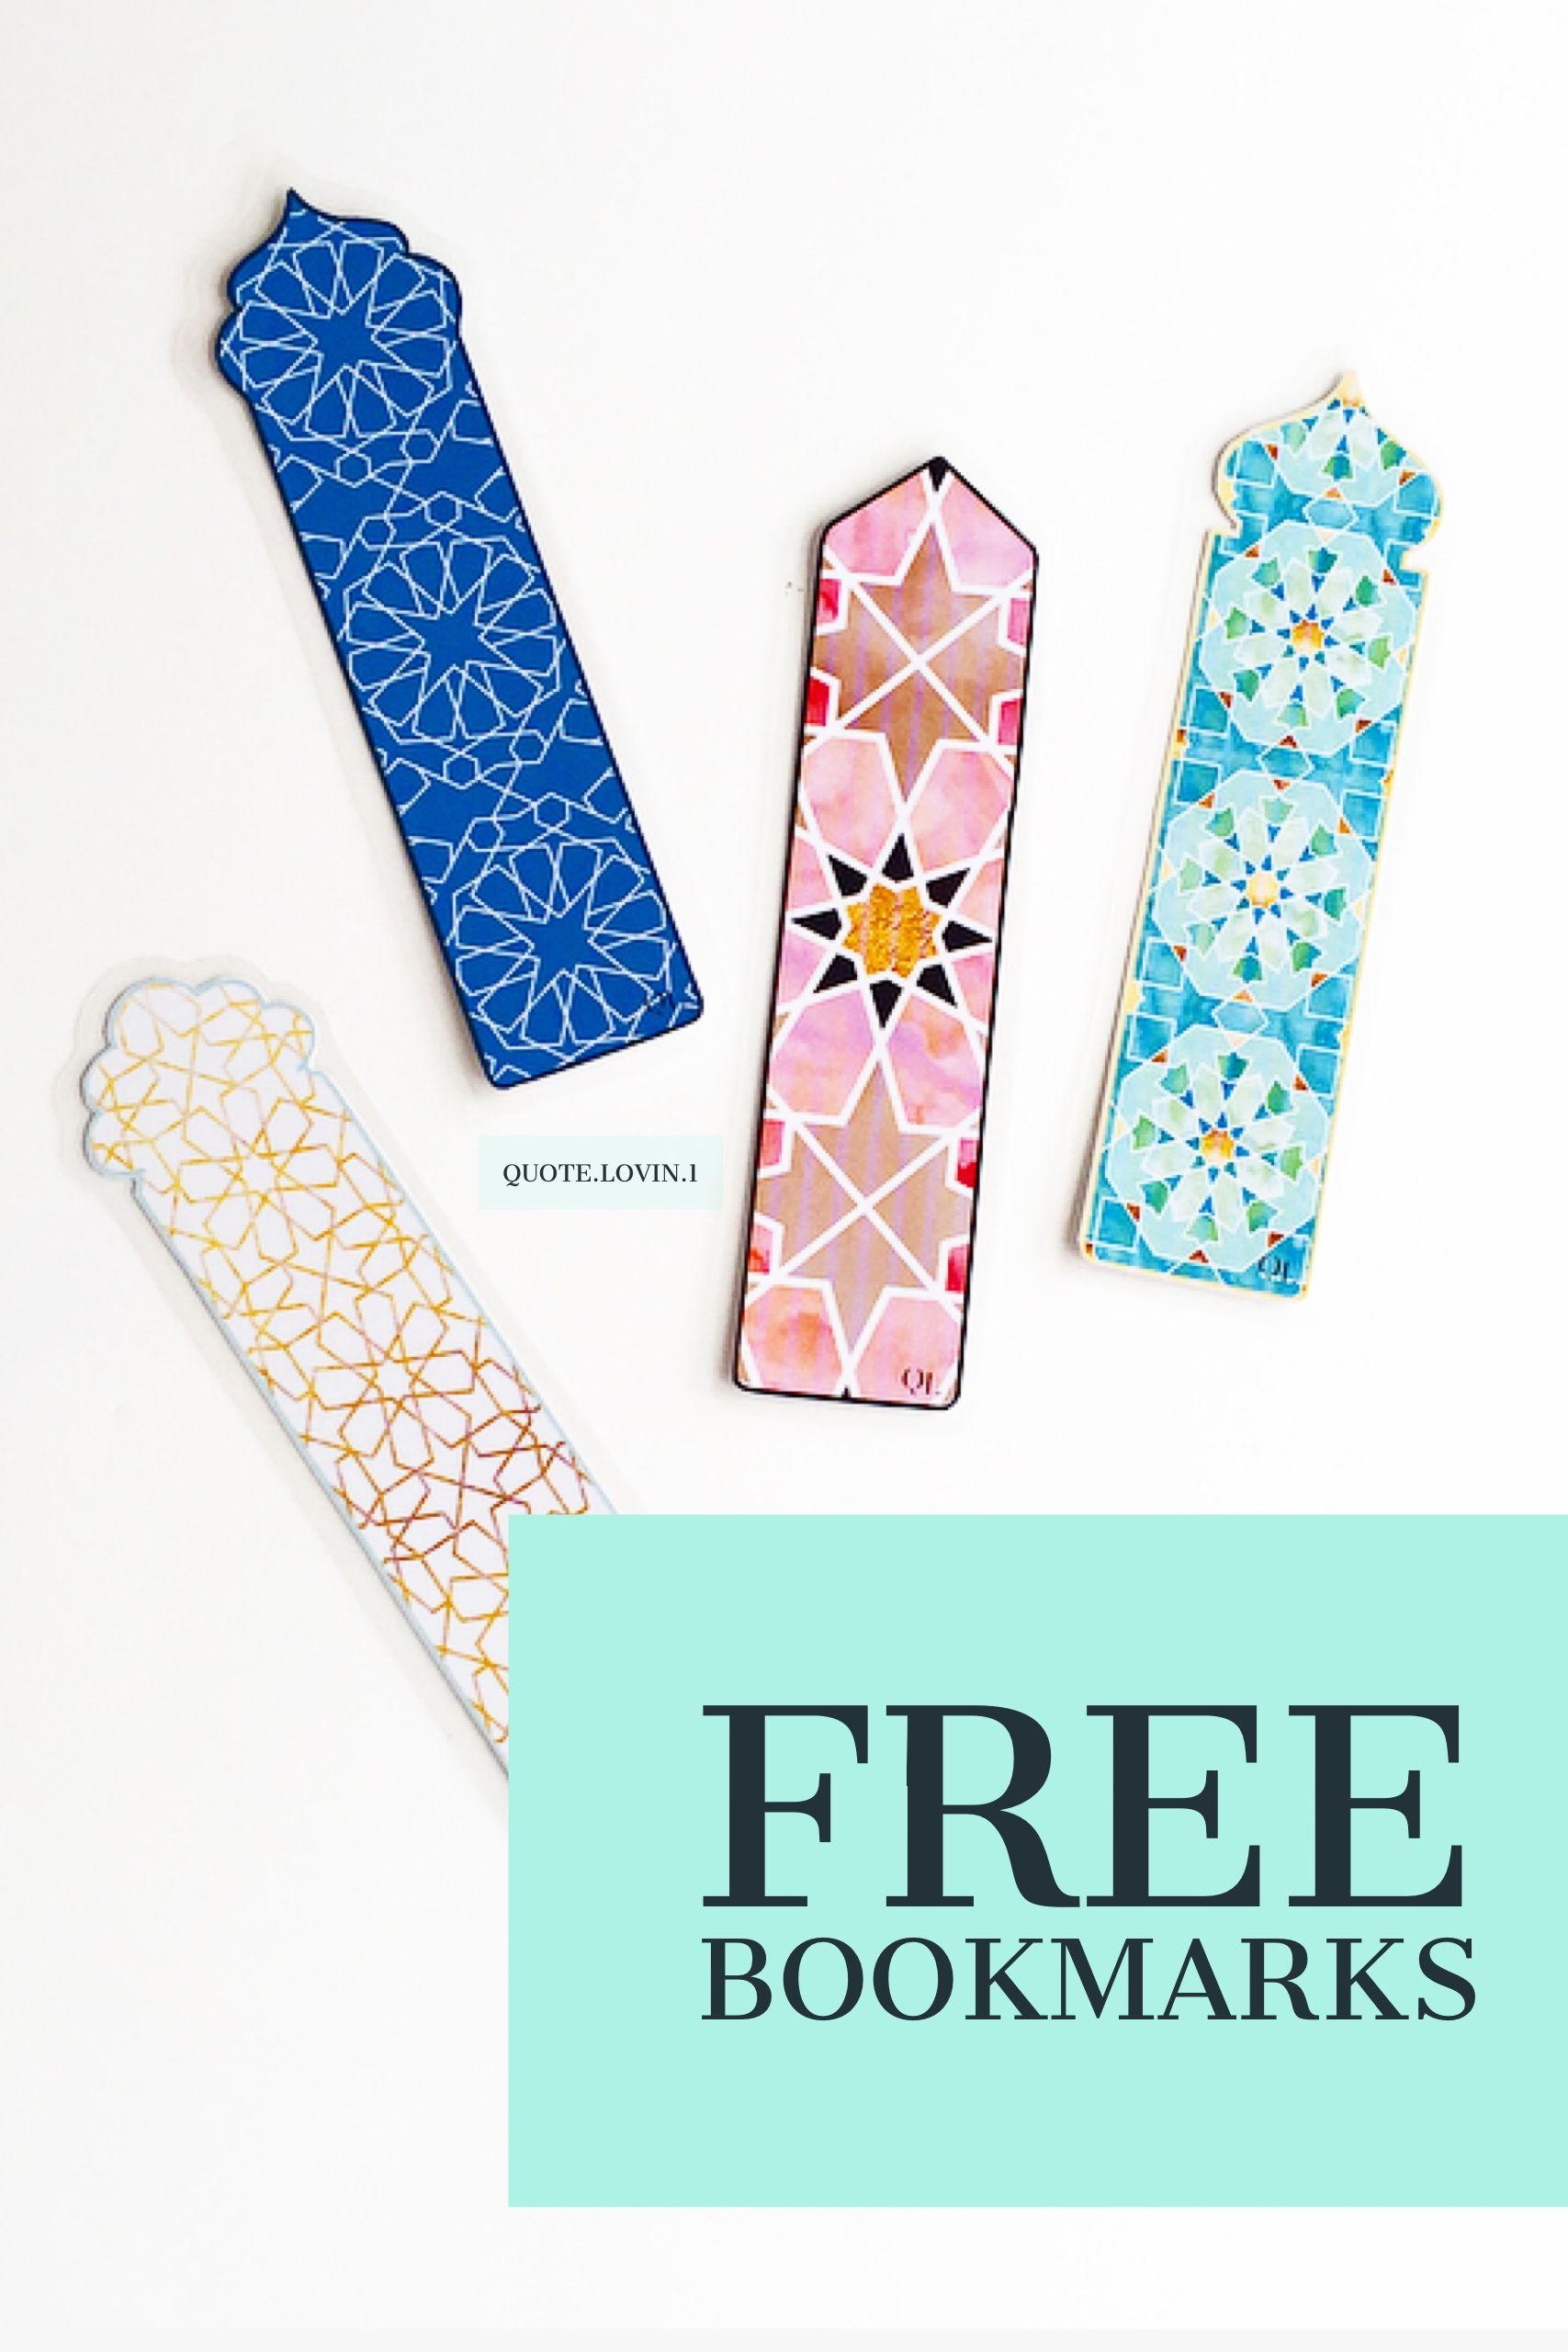 Pin By Eenatif On Your Pinterest Likes Bookmarks Handmade Ramadan Gifts Ramadan Kids